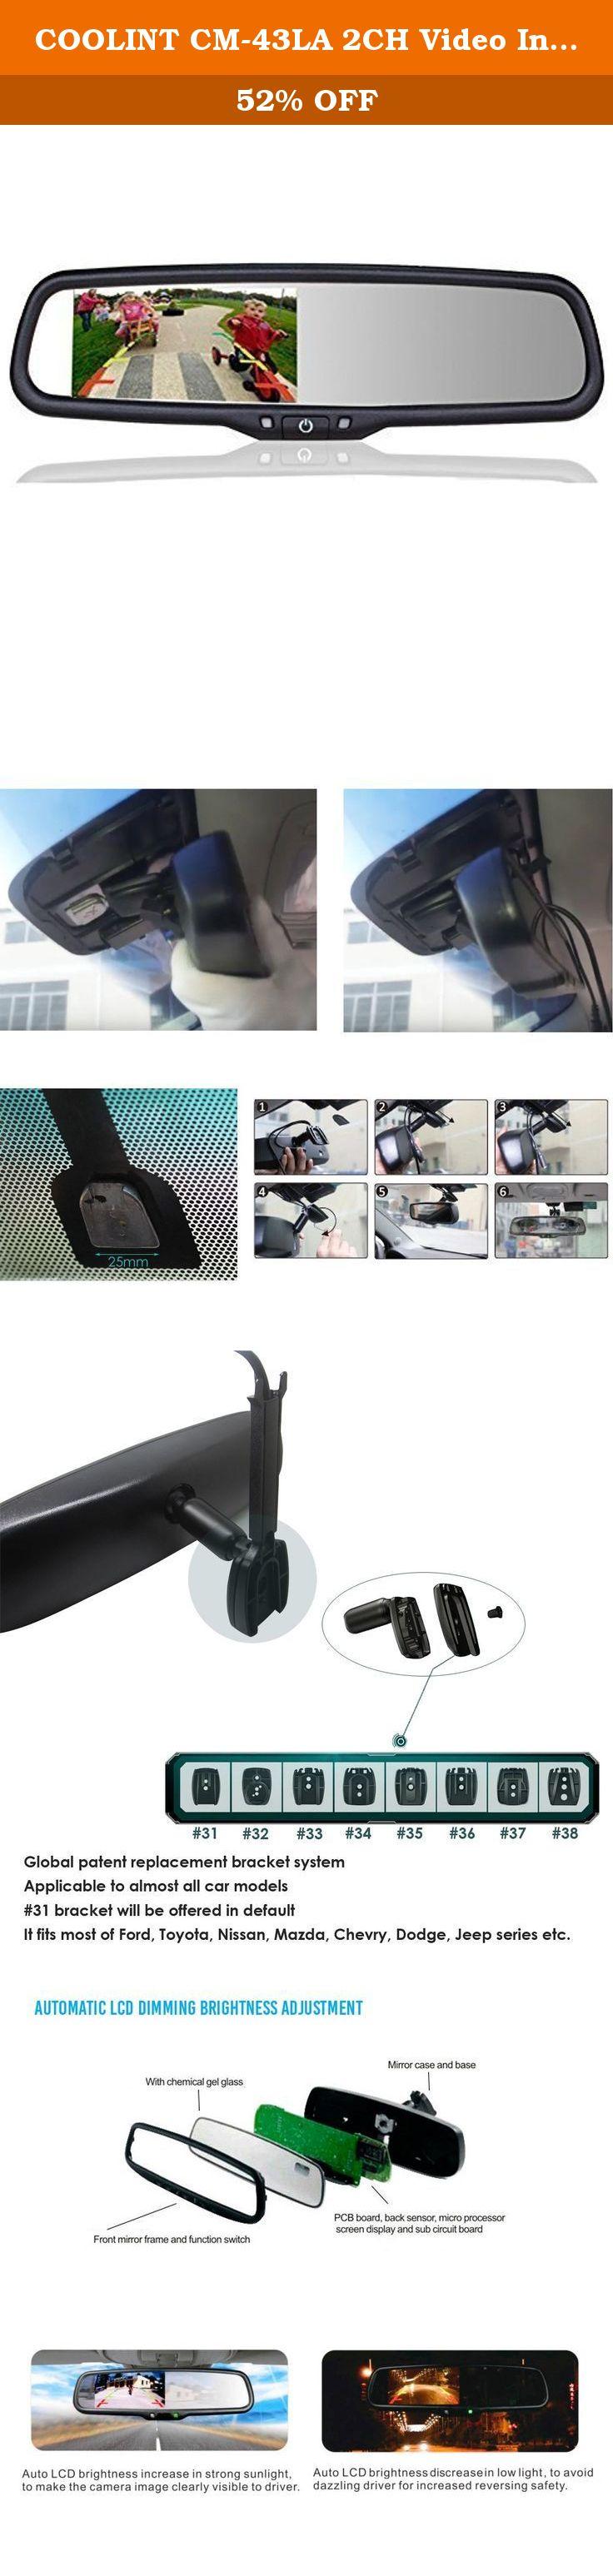 Coolint Cm 43la 2ch Video Input 4 3 Auto Adjust Brightness Lcd Rear View Mirror Monitor For Toyota Nissan Mazda Ford L Car Bluetooth Rear Mirror Backup Camera